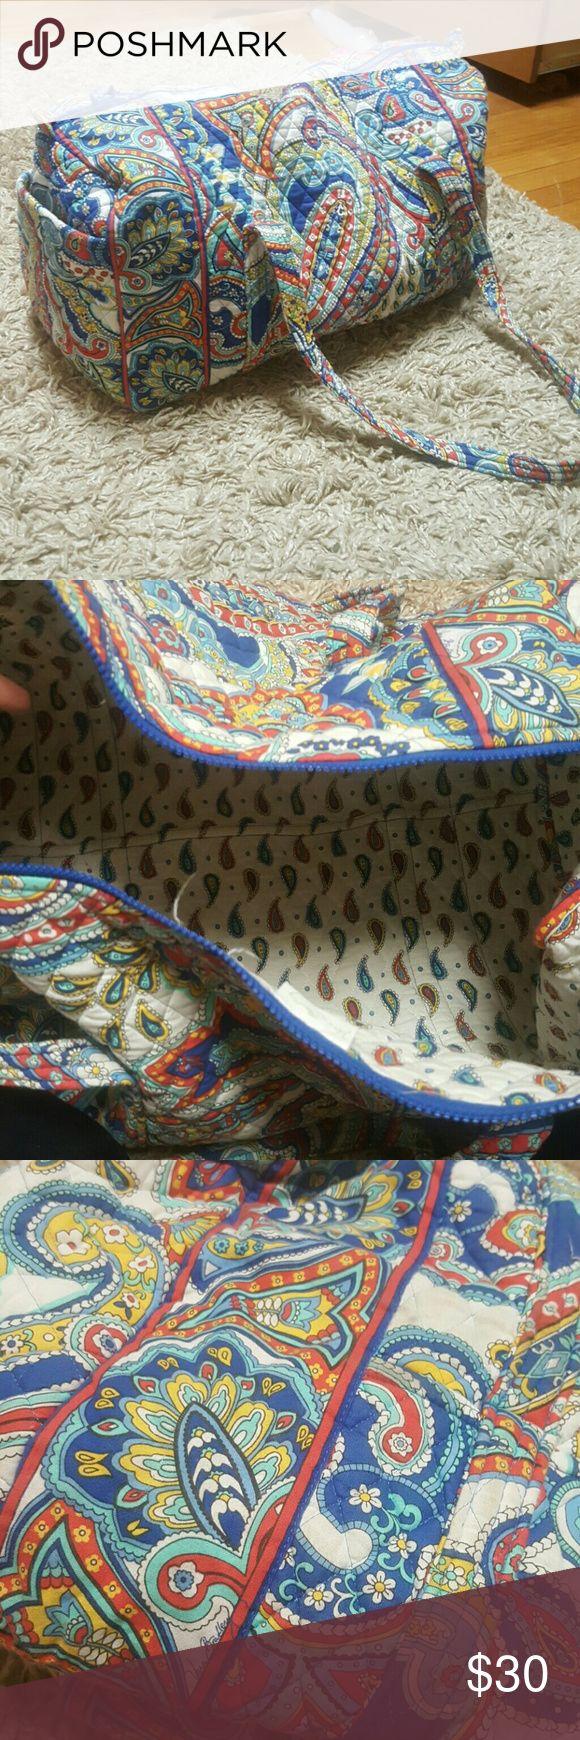 Retired Vera Bradley Large Duffel Marina paisley patterned large duffel, lightly used! Vera Bradley Bags Travel Bags